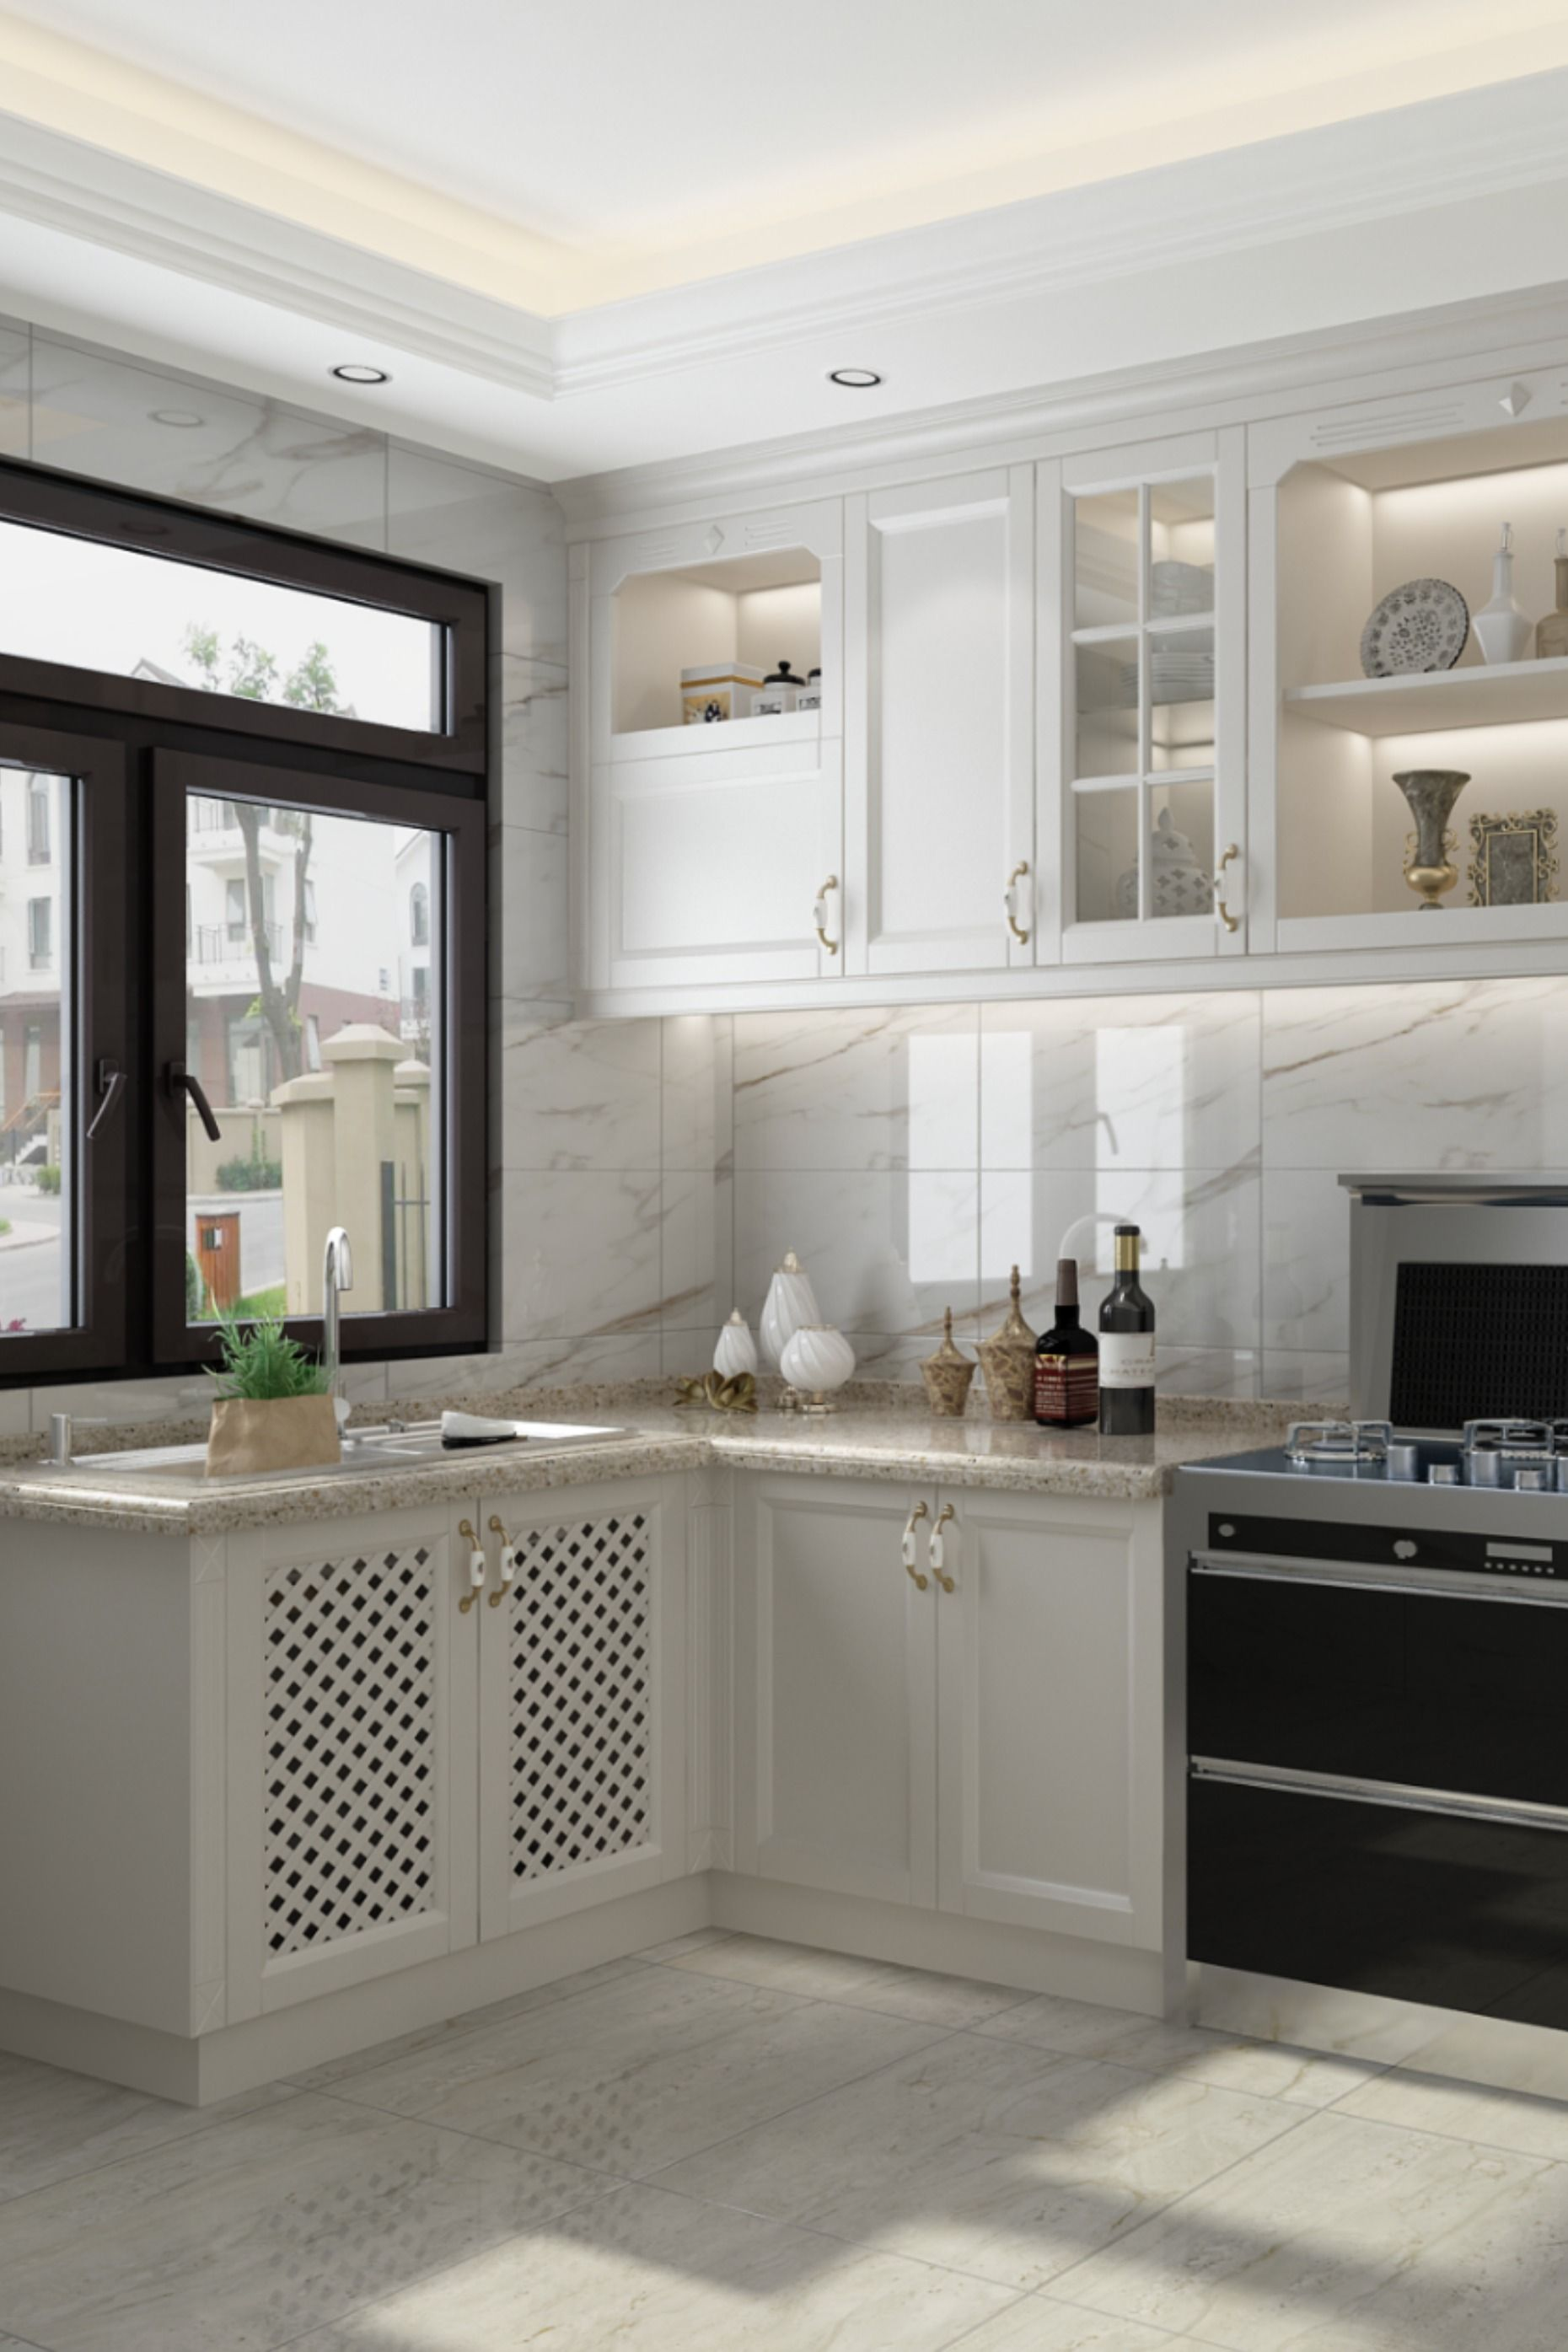 Best China Pvc Blister Kitchen Cabinet Kitchen Cabinet Styles Small Kitchen Decor Kitchen Cabinets